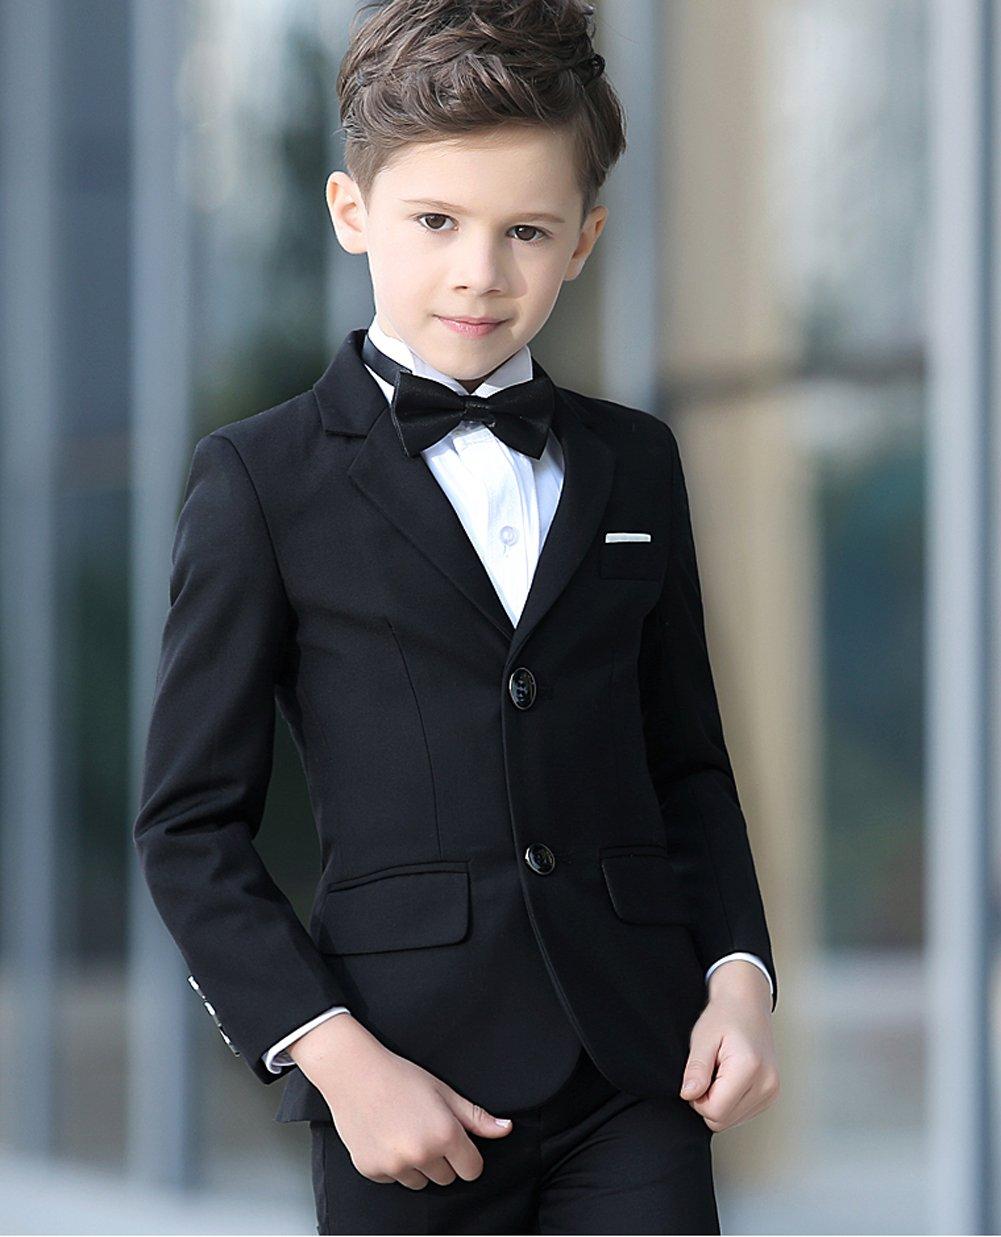 YuanLu Boys Colorful Formal Suits 5 Piece Slim Fit Dresswear Suit Set (Black, 14) by YuanLu (Image #5)